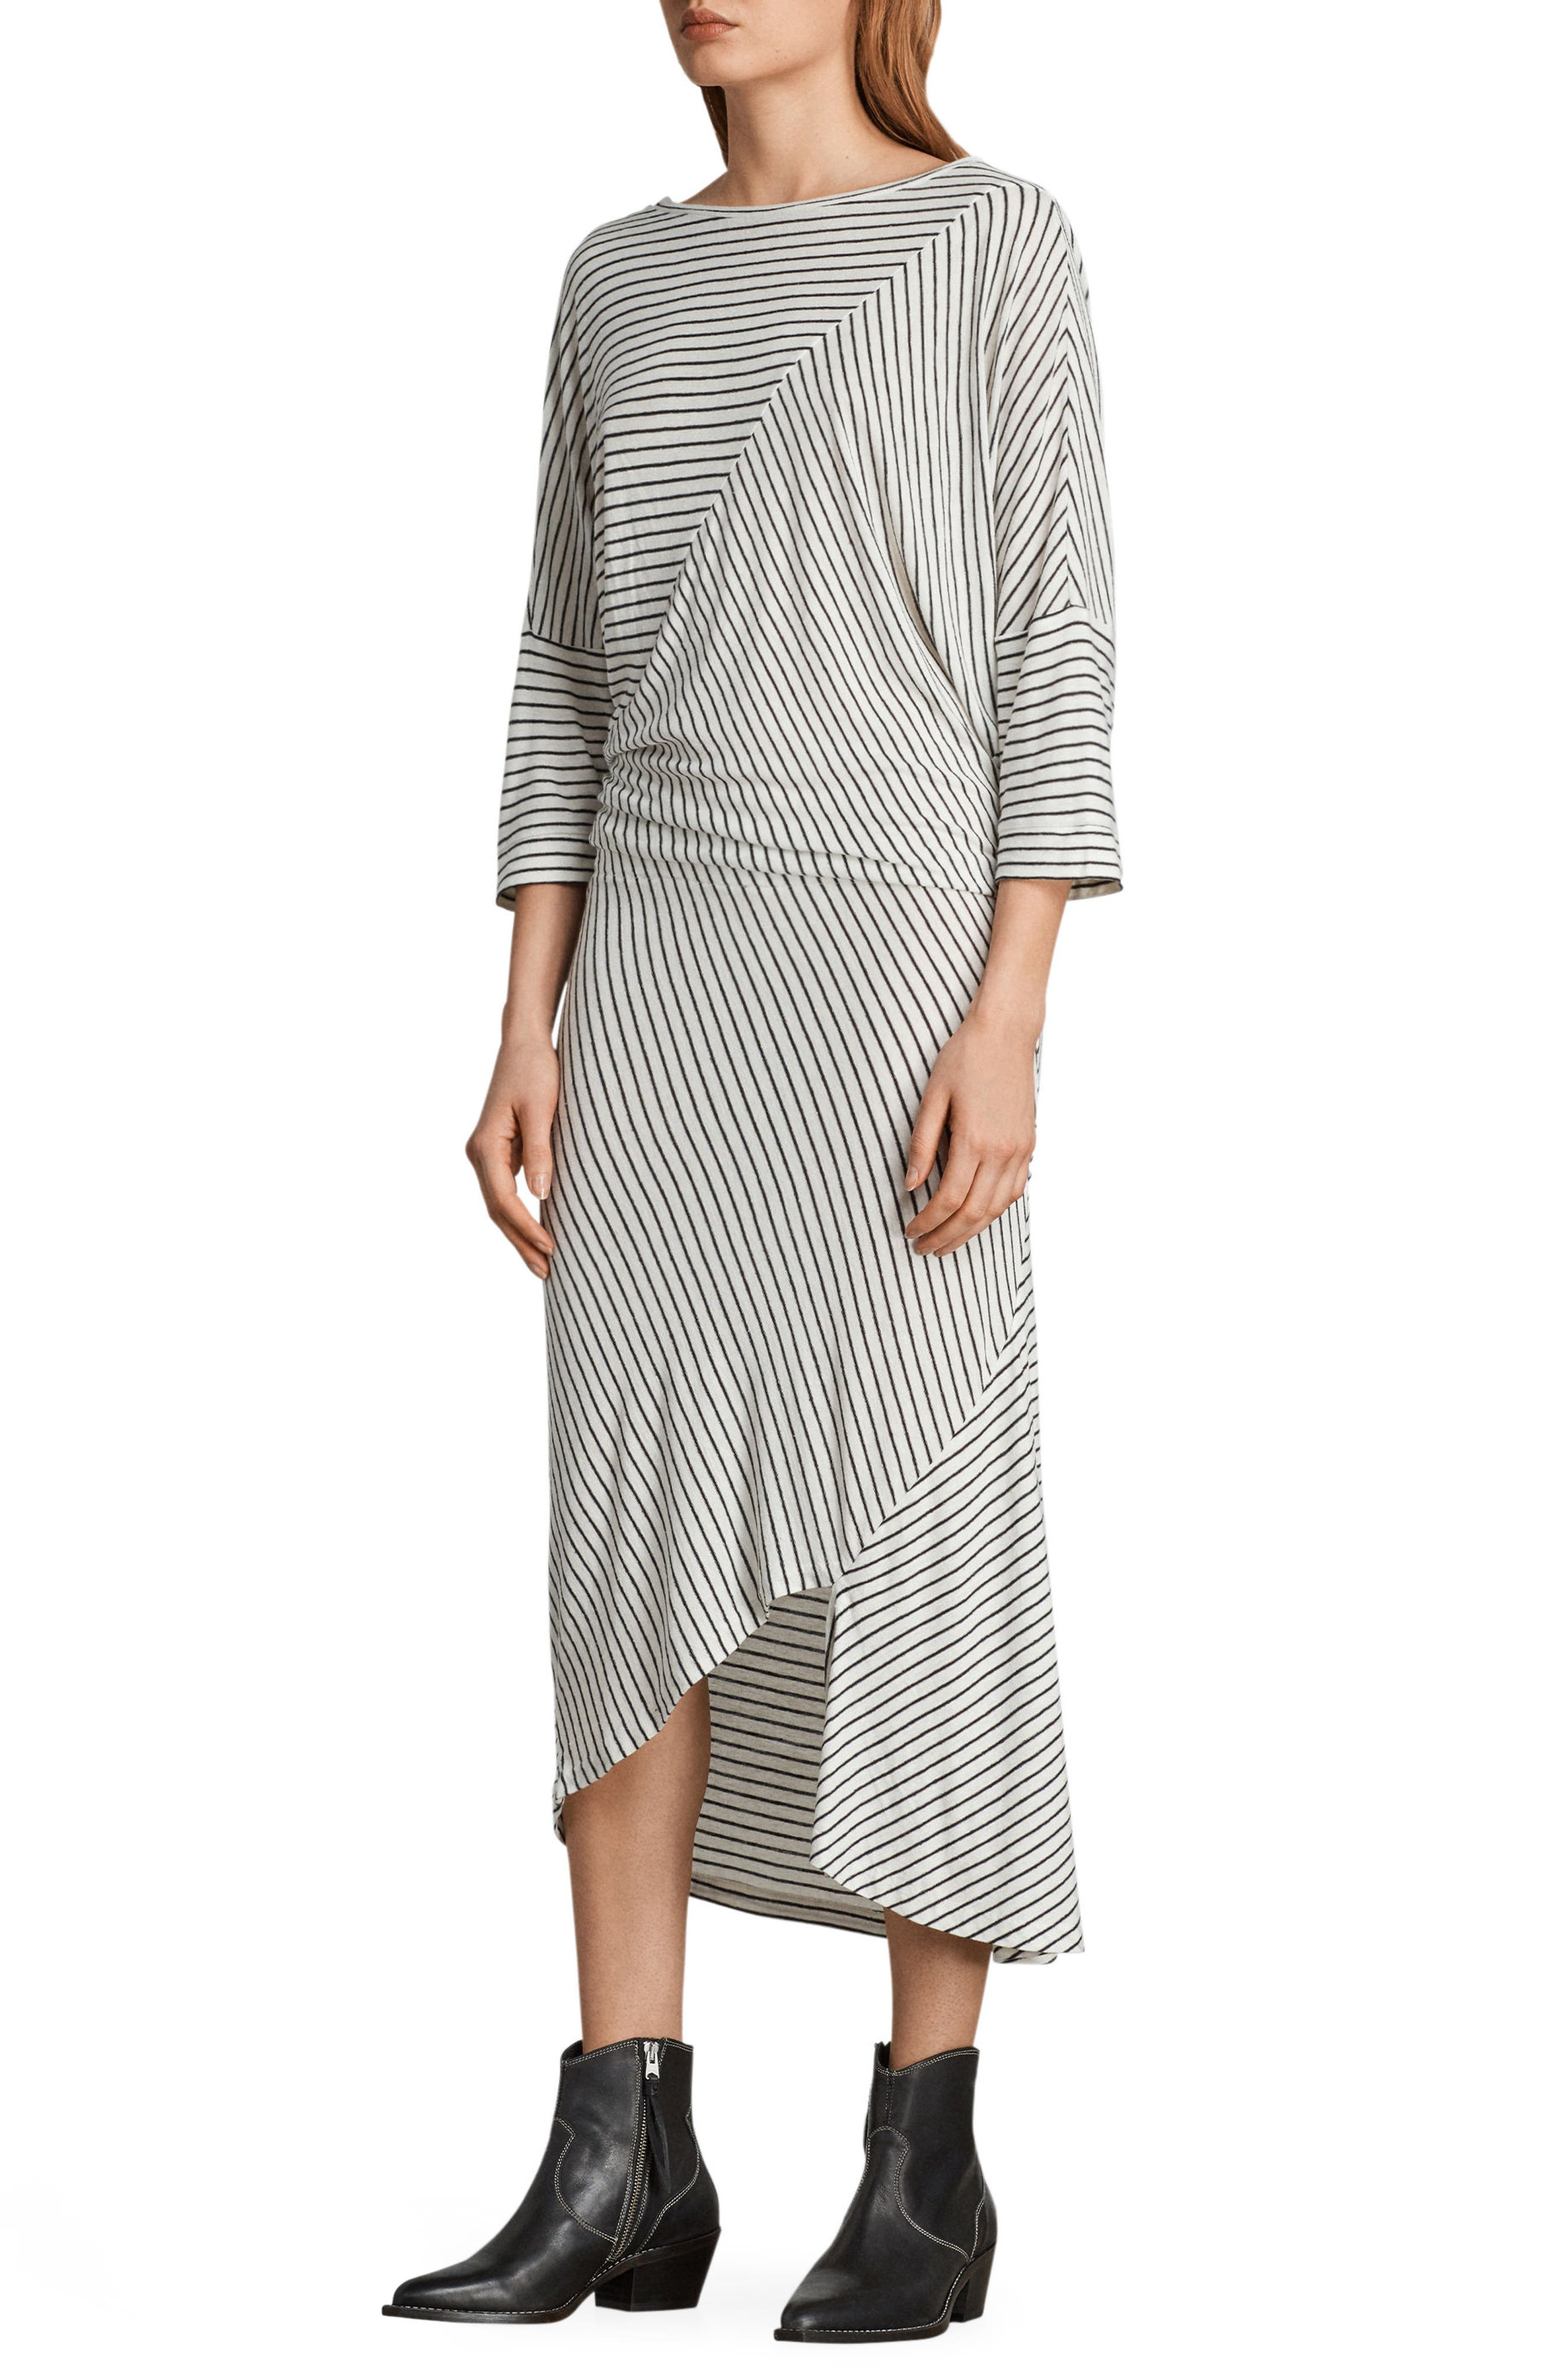 Cadie Stripe Midi Dress,                             Alternate thumbnail 3, color,                             116